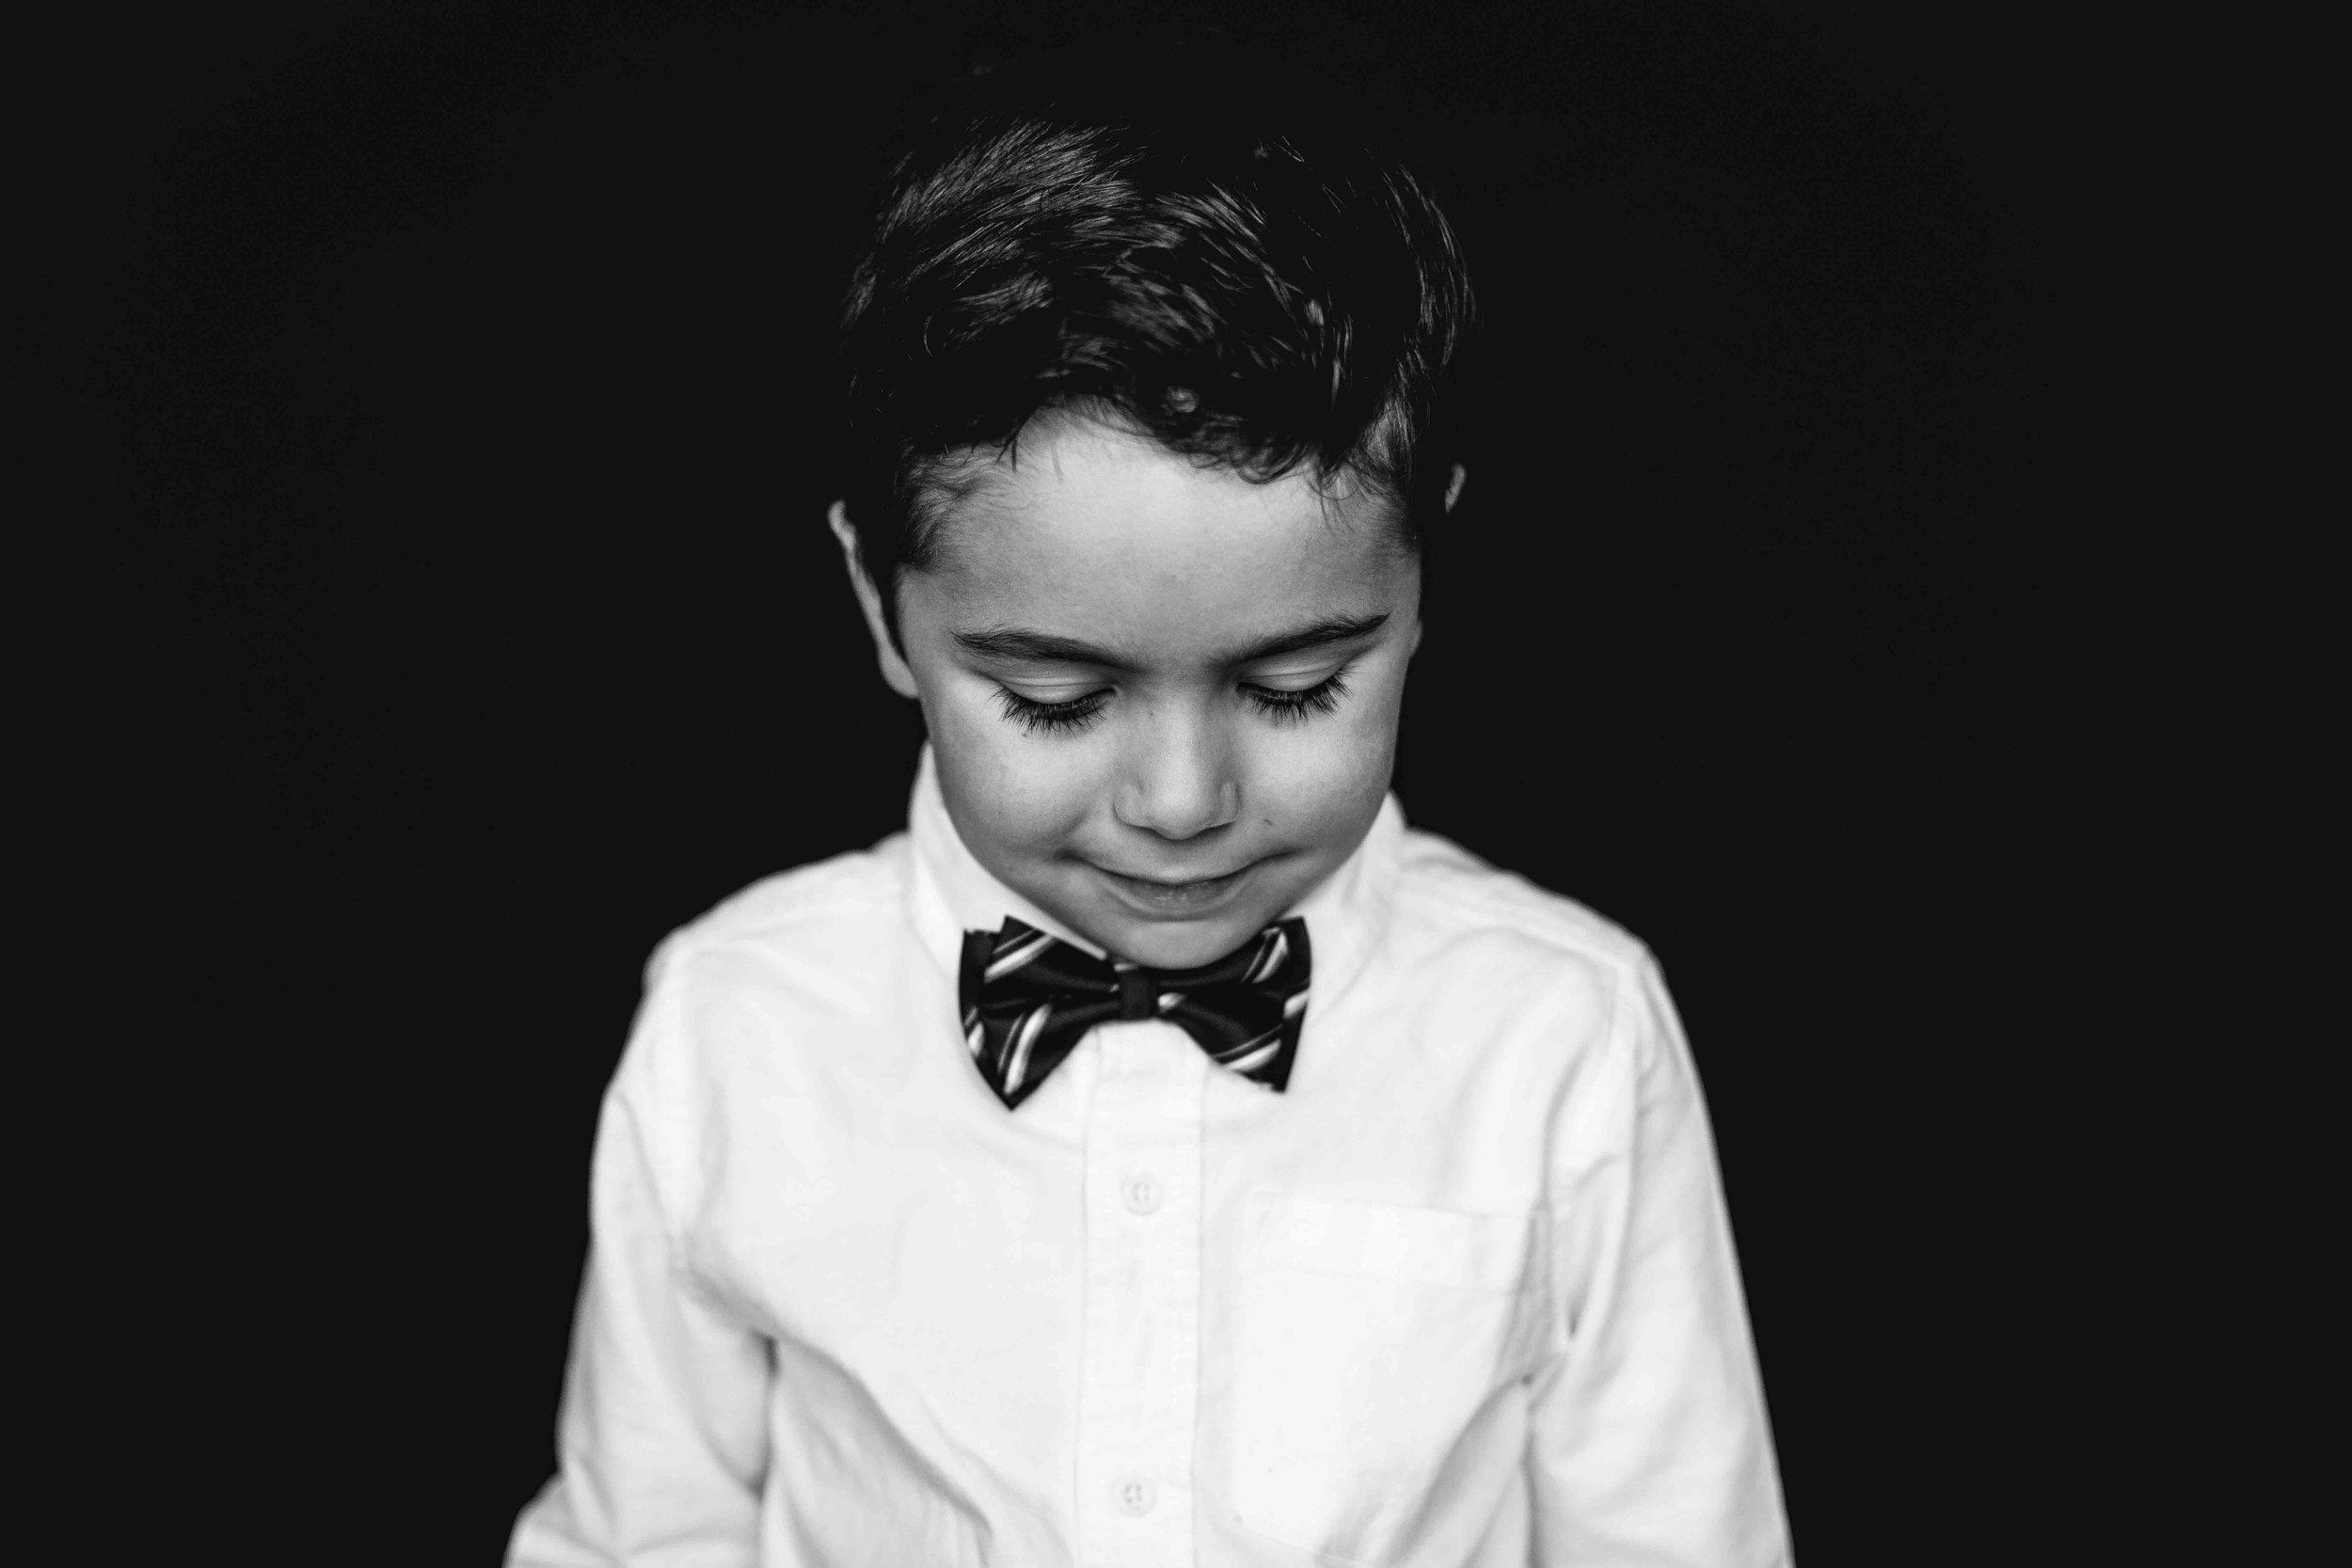 20180914_9658---kindergarten----65BLACK&WHITE65snowflake-pittsburgh-boutique-school-photography.jpg